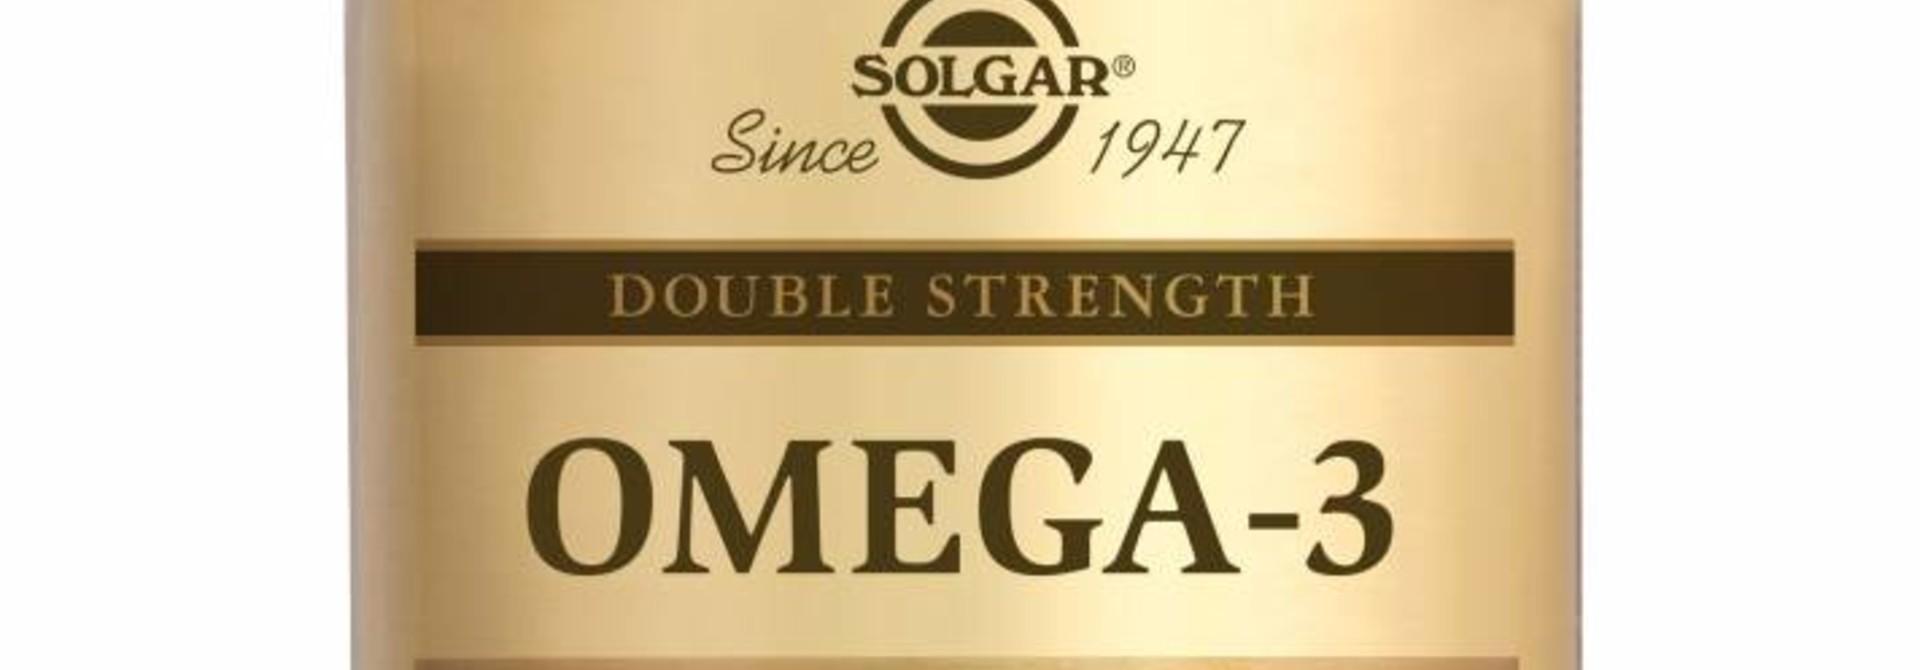 Omega-3 Double Strength 30 softgels